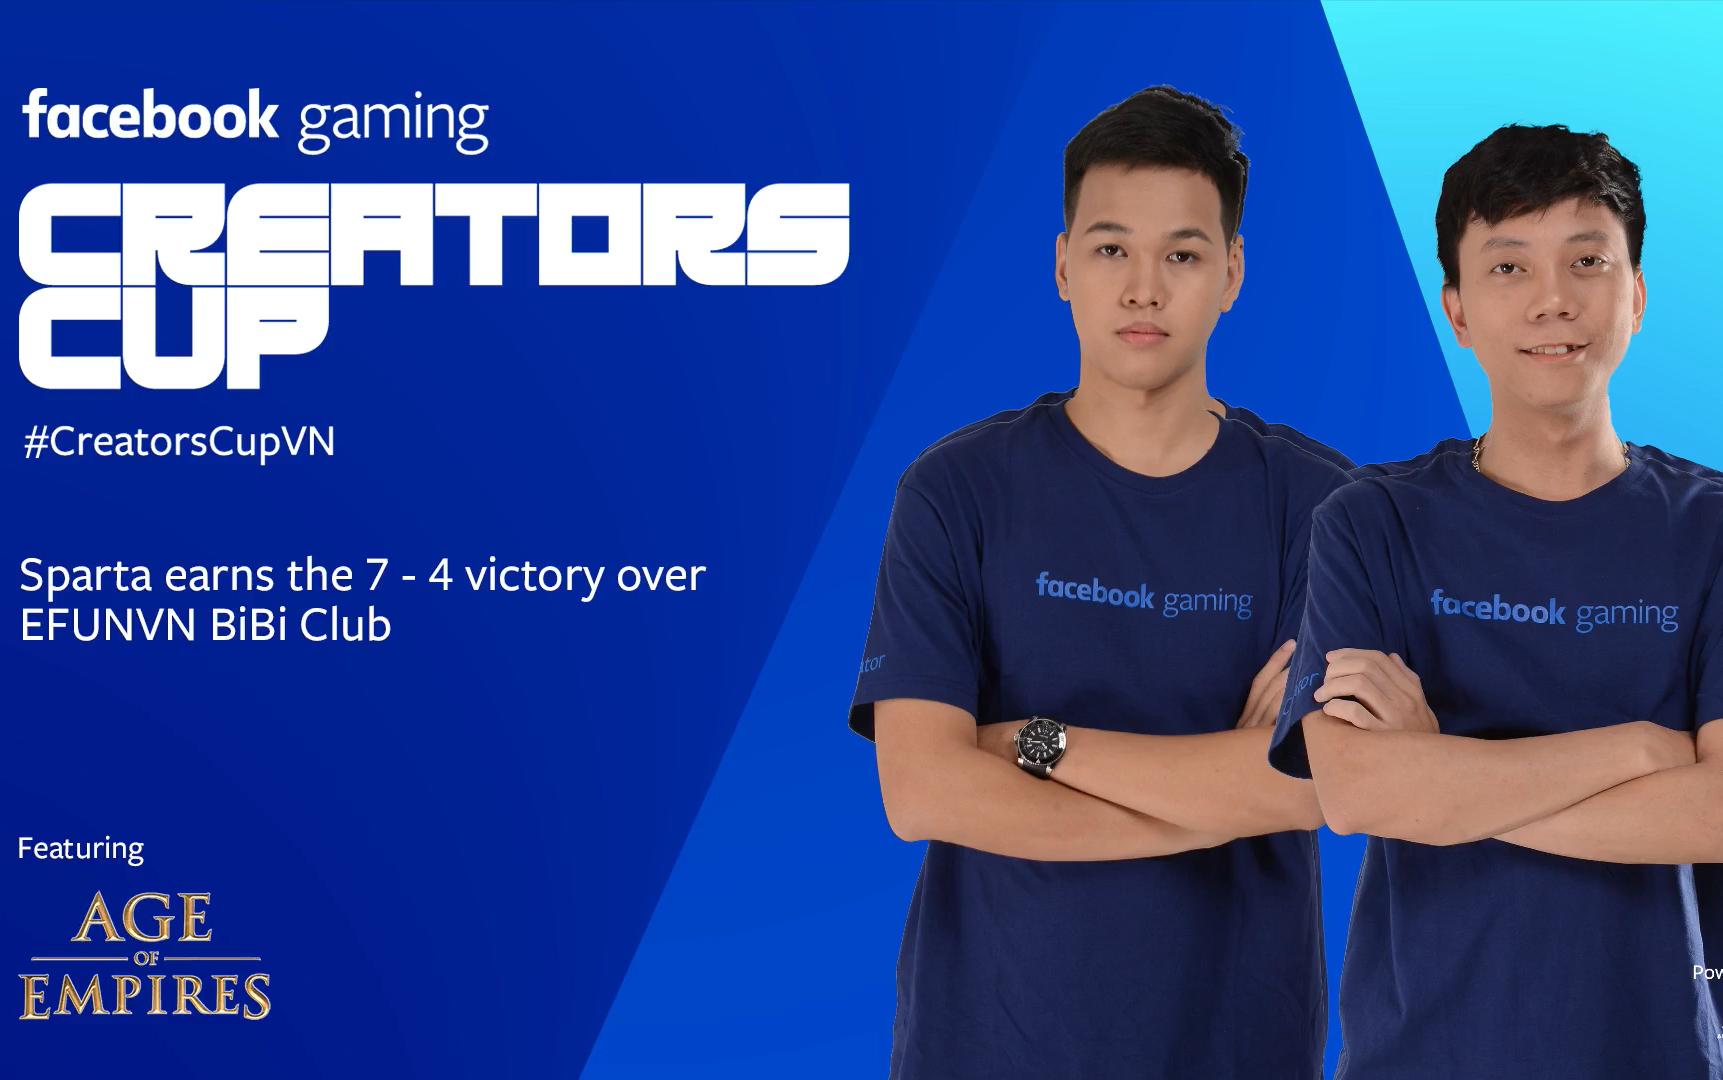 Sparta phá 'dớp' thất bại, thẳng tiến Chung kết AoE Facebook Gaming Creators Cup 2019